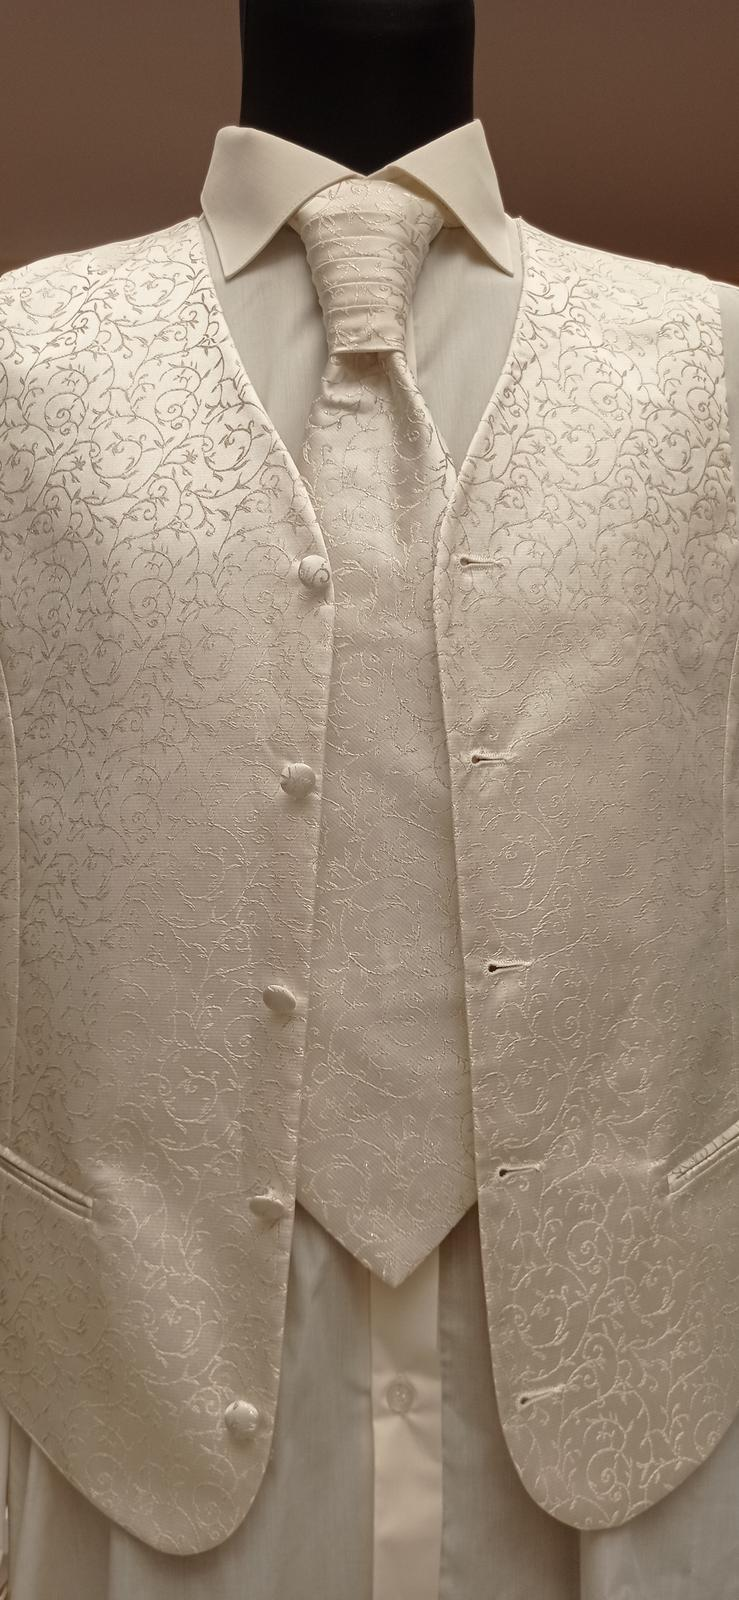 set kravata, vesta, vreckouka - Obrázok č. 1